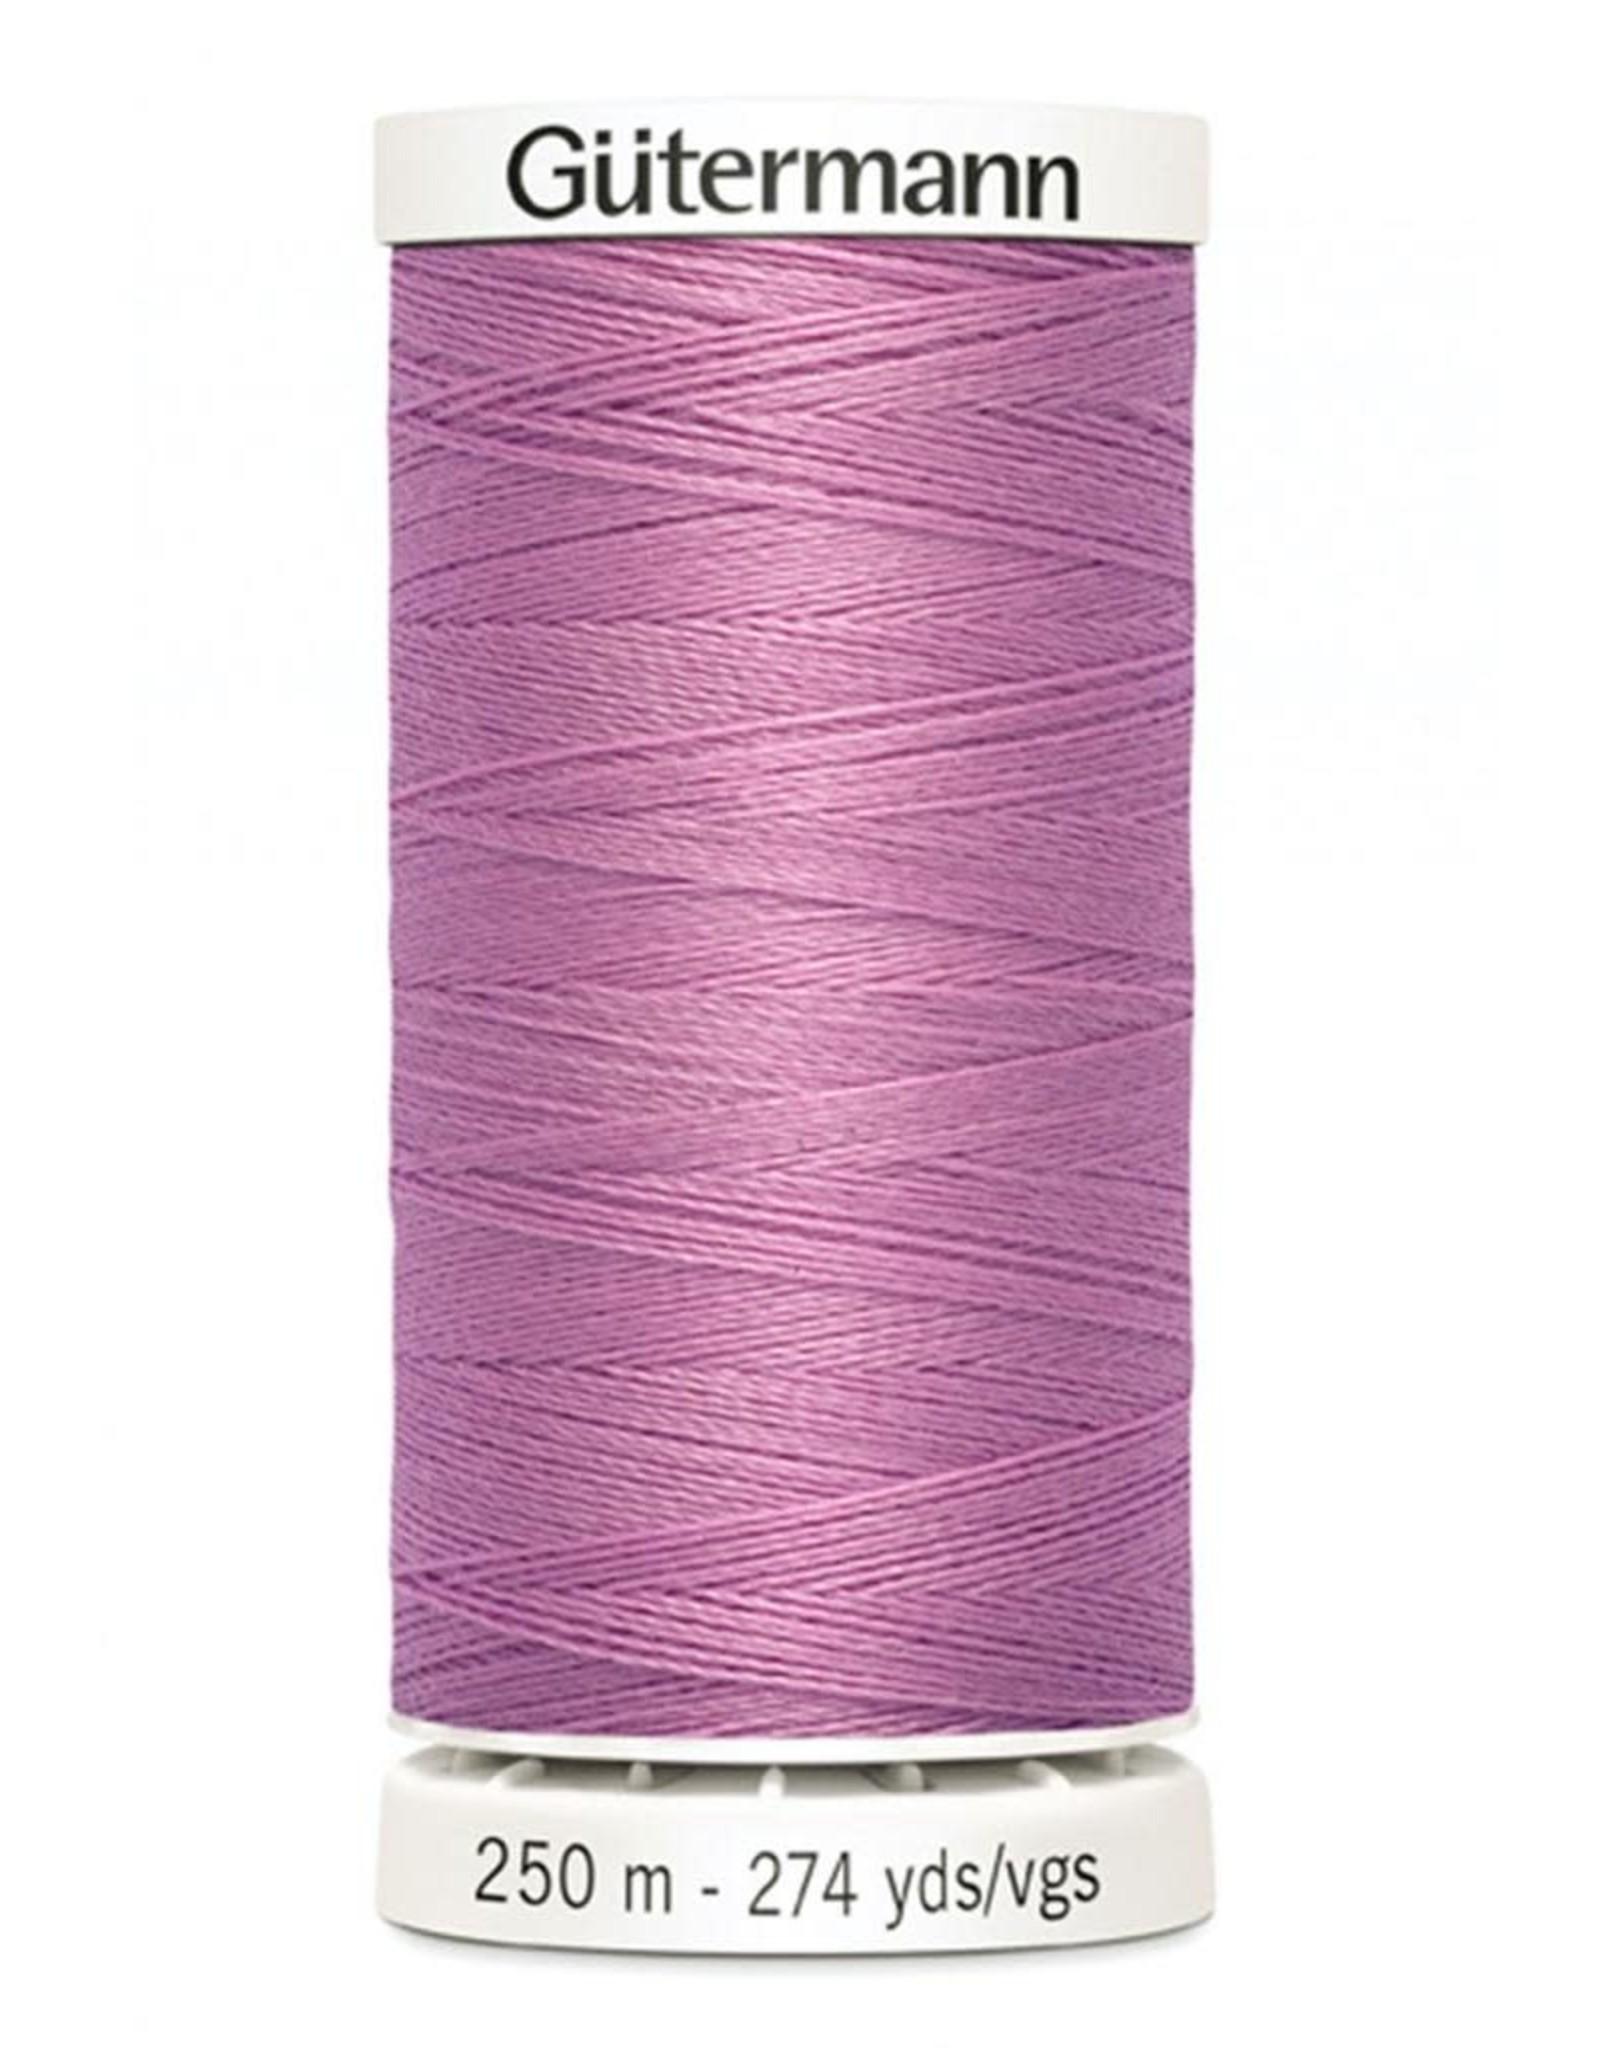 Gutermann Gutermann Thread, 250M-913 Rose Lilac, Sew-All Polyester All Purpose Thread, 250m/273yds